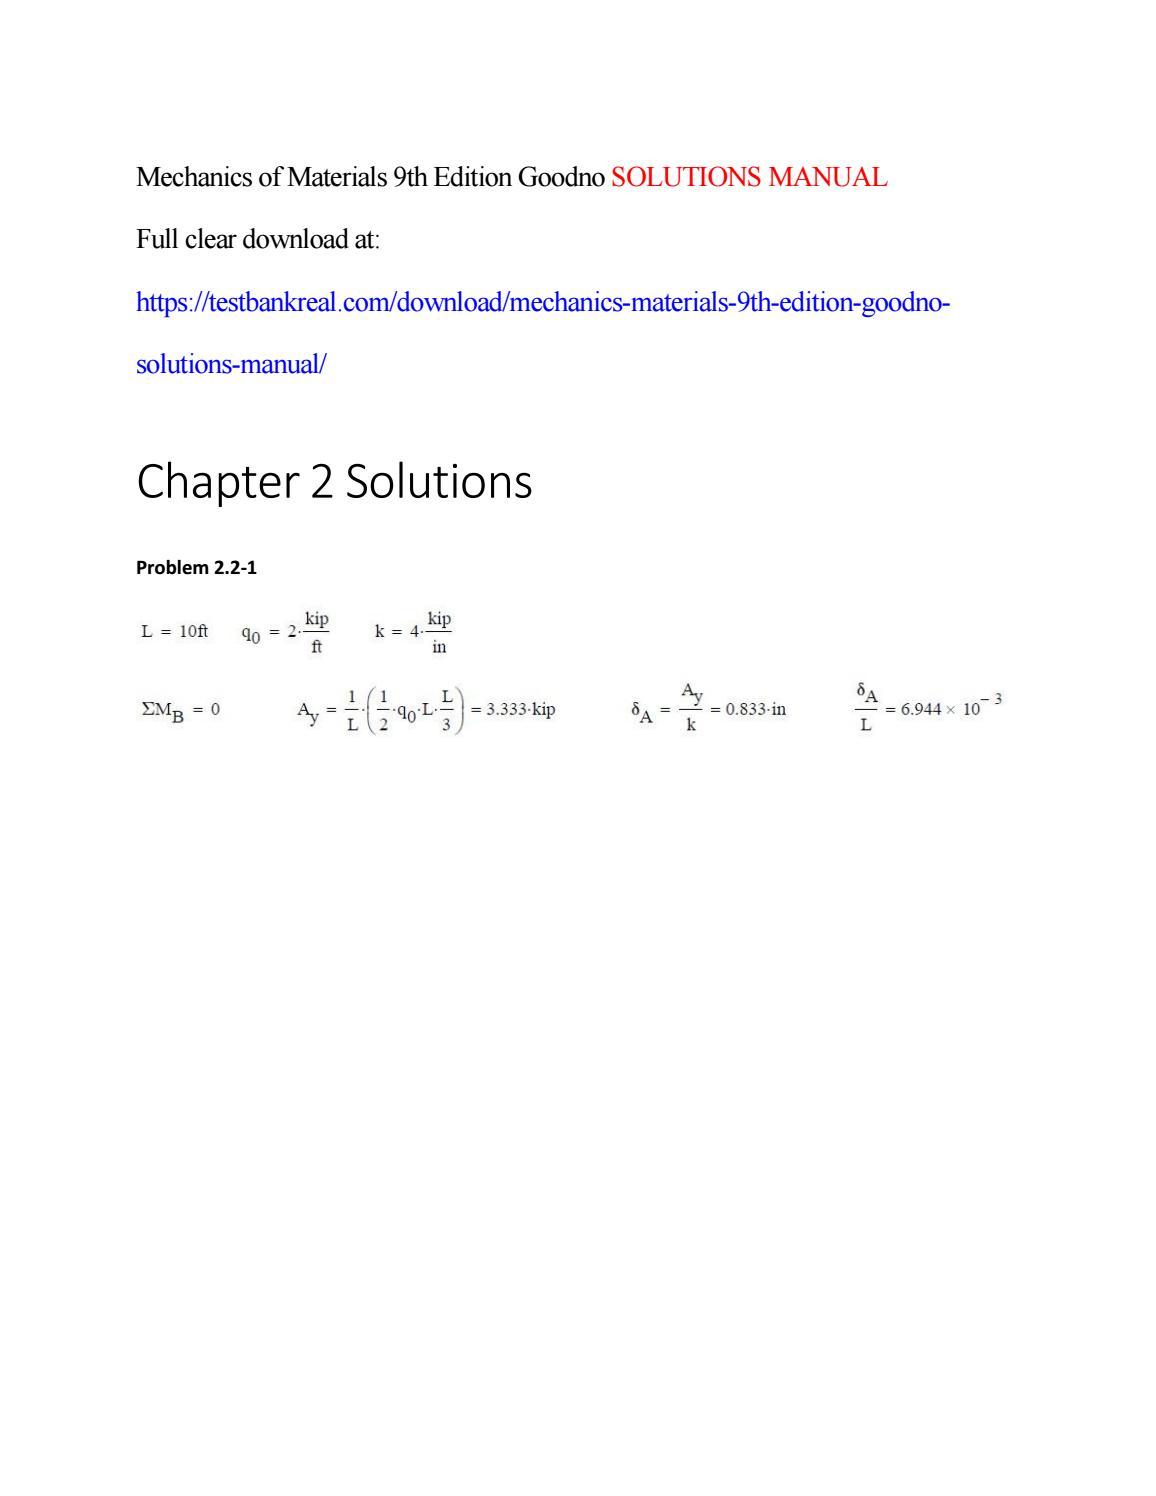 Mechanics Of Materials 9th Edition Pdf Goodno